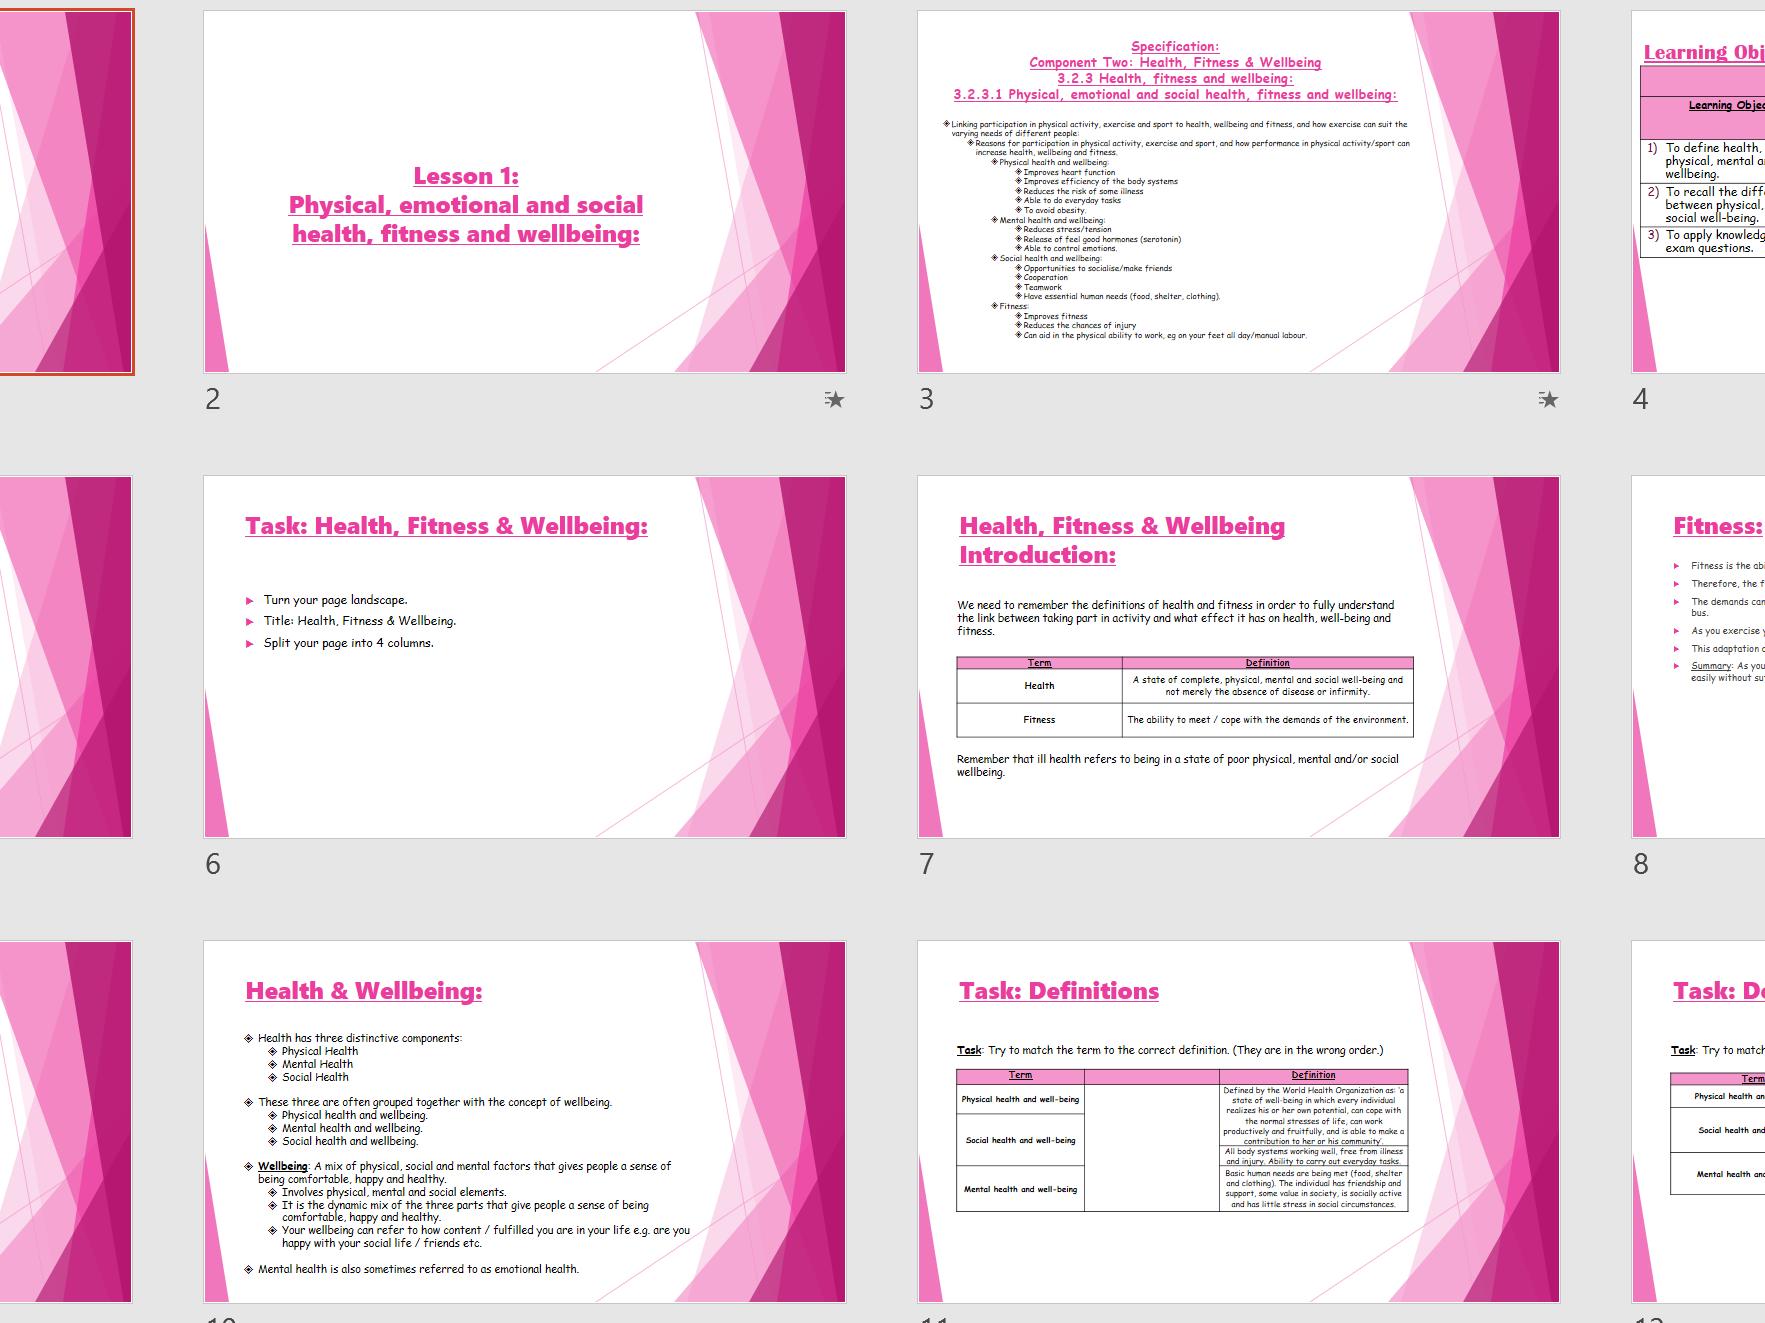 AQA 9-1 GCSE PE - Health Fitness & Wellbeing Topic Resource Bundle